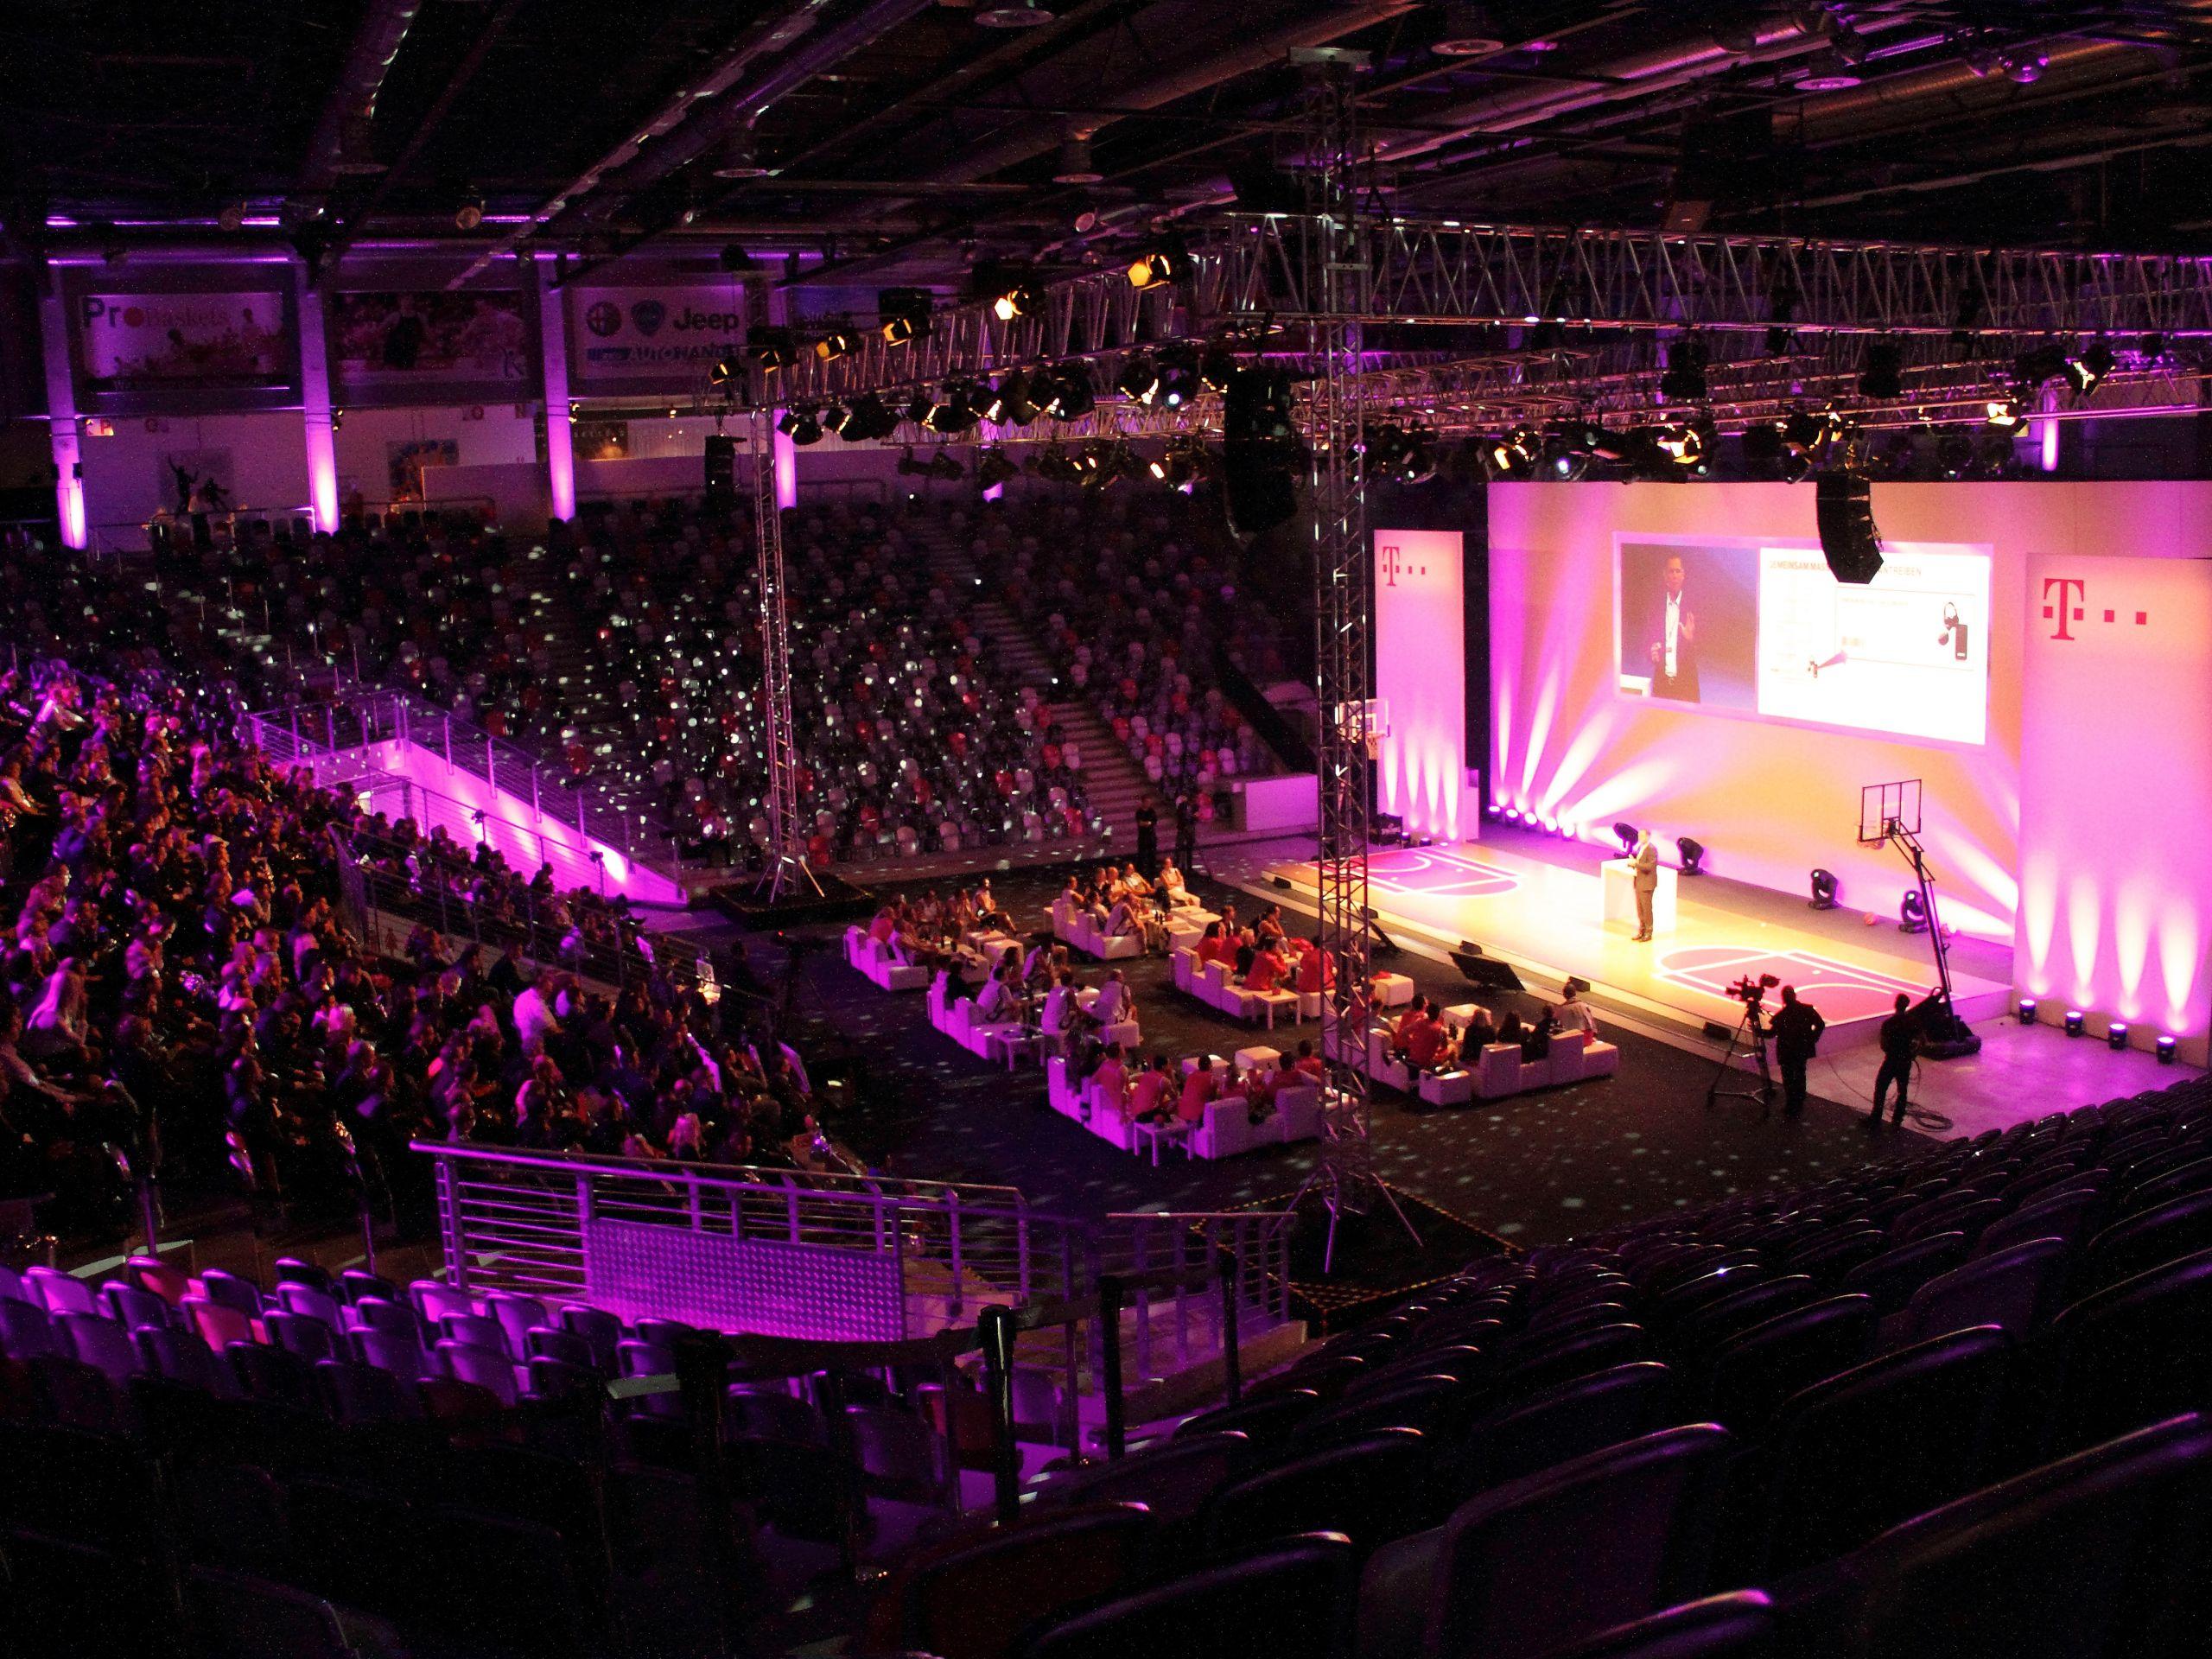 Telekom Eventkaskade Veranstaltung Event 009